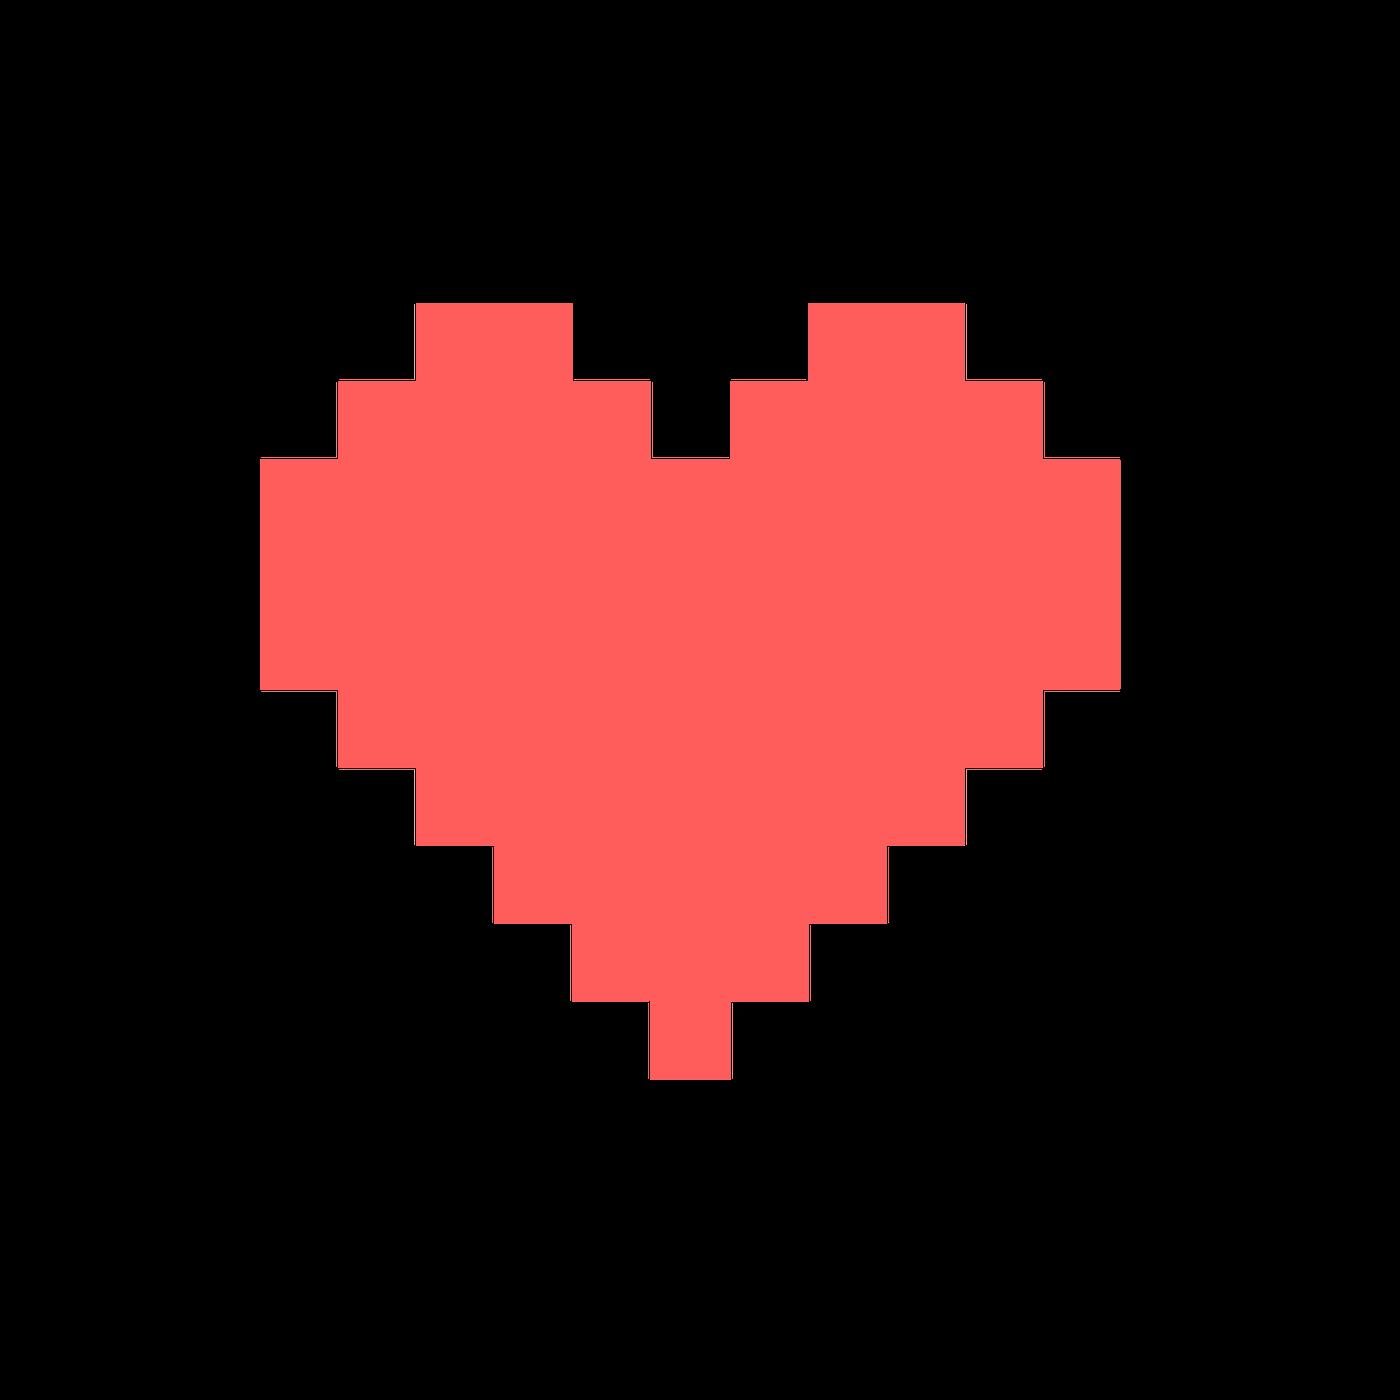 Pixel heart png Free Download.